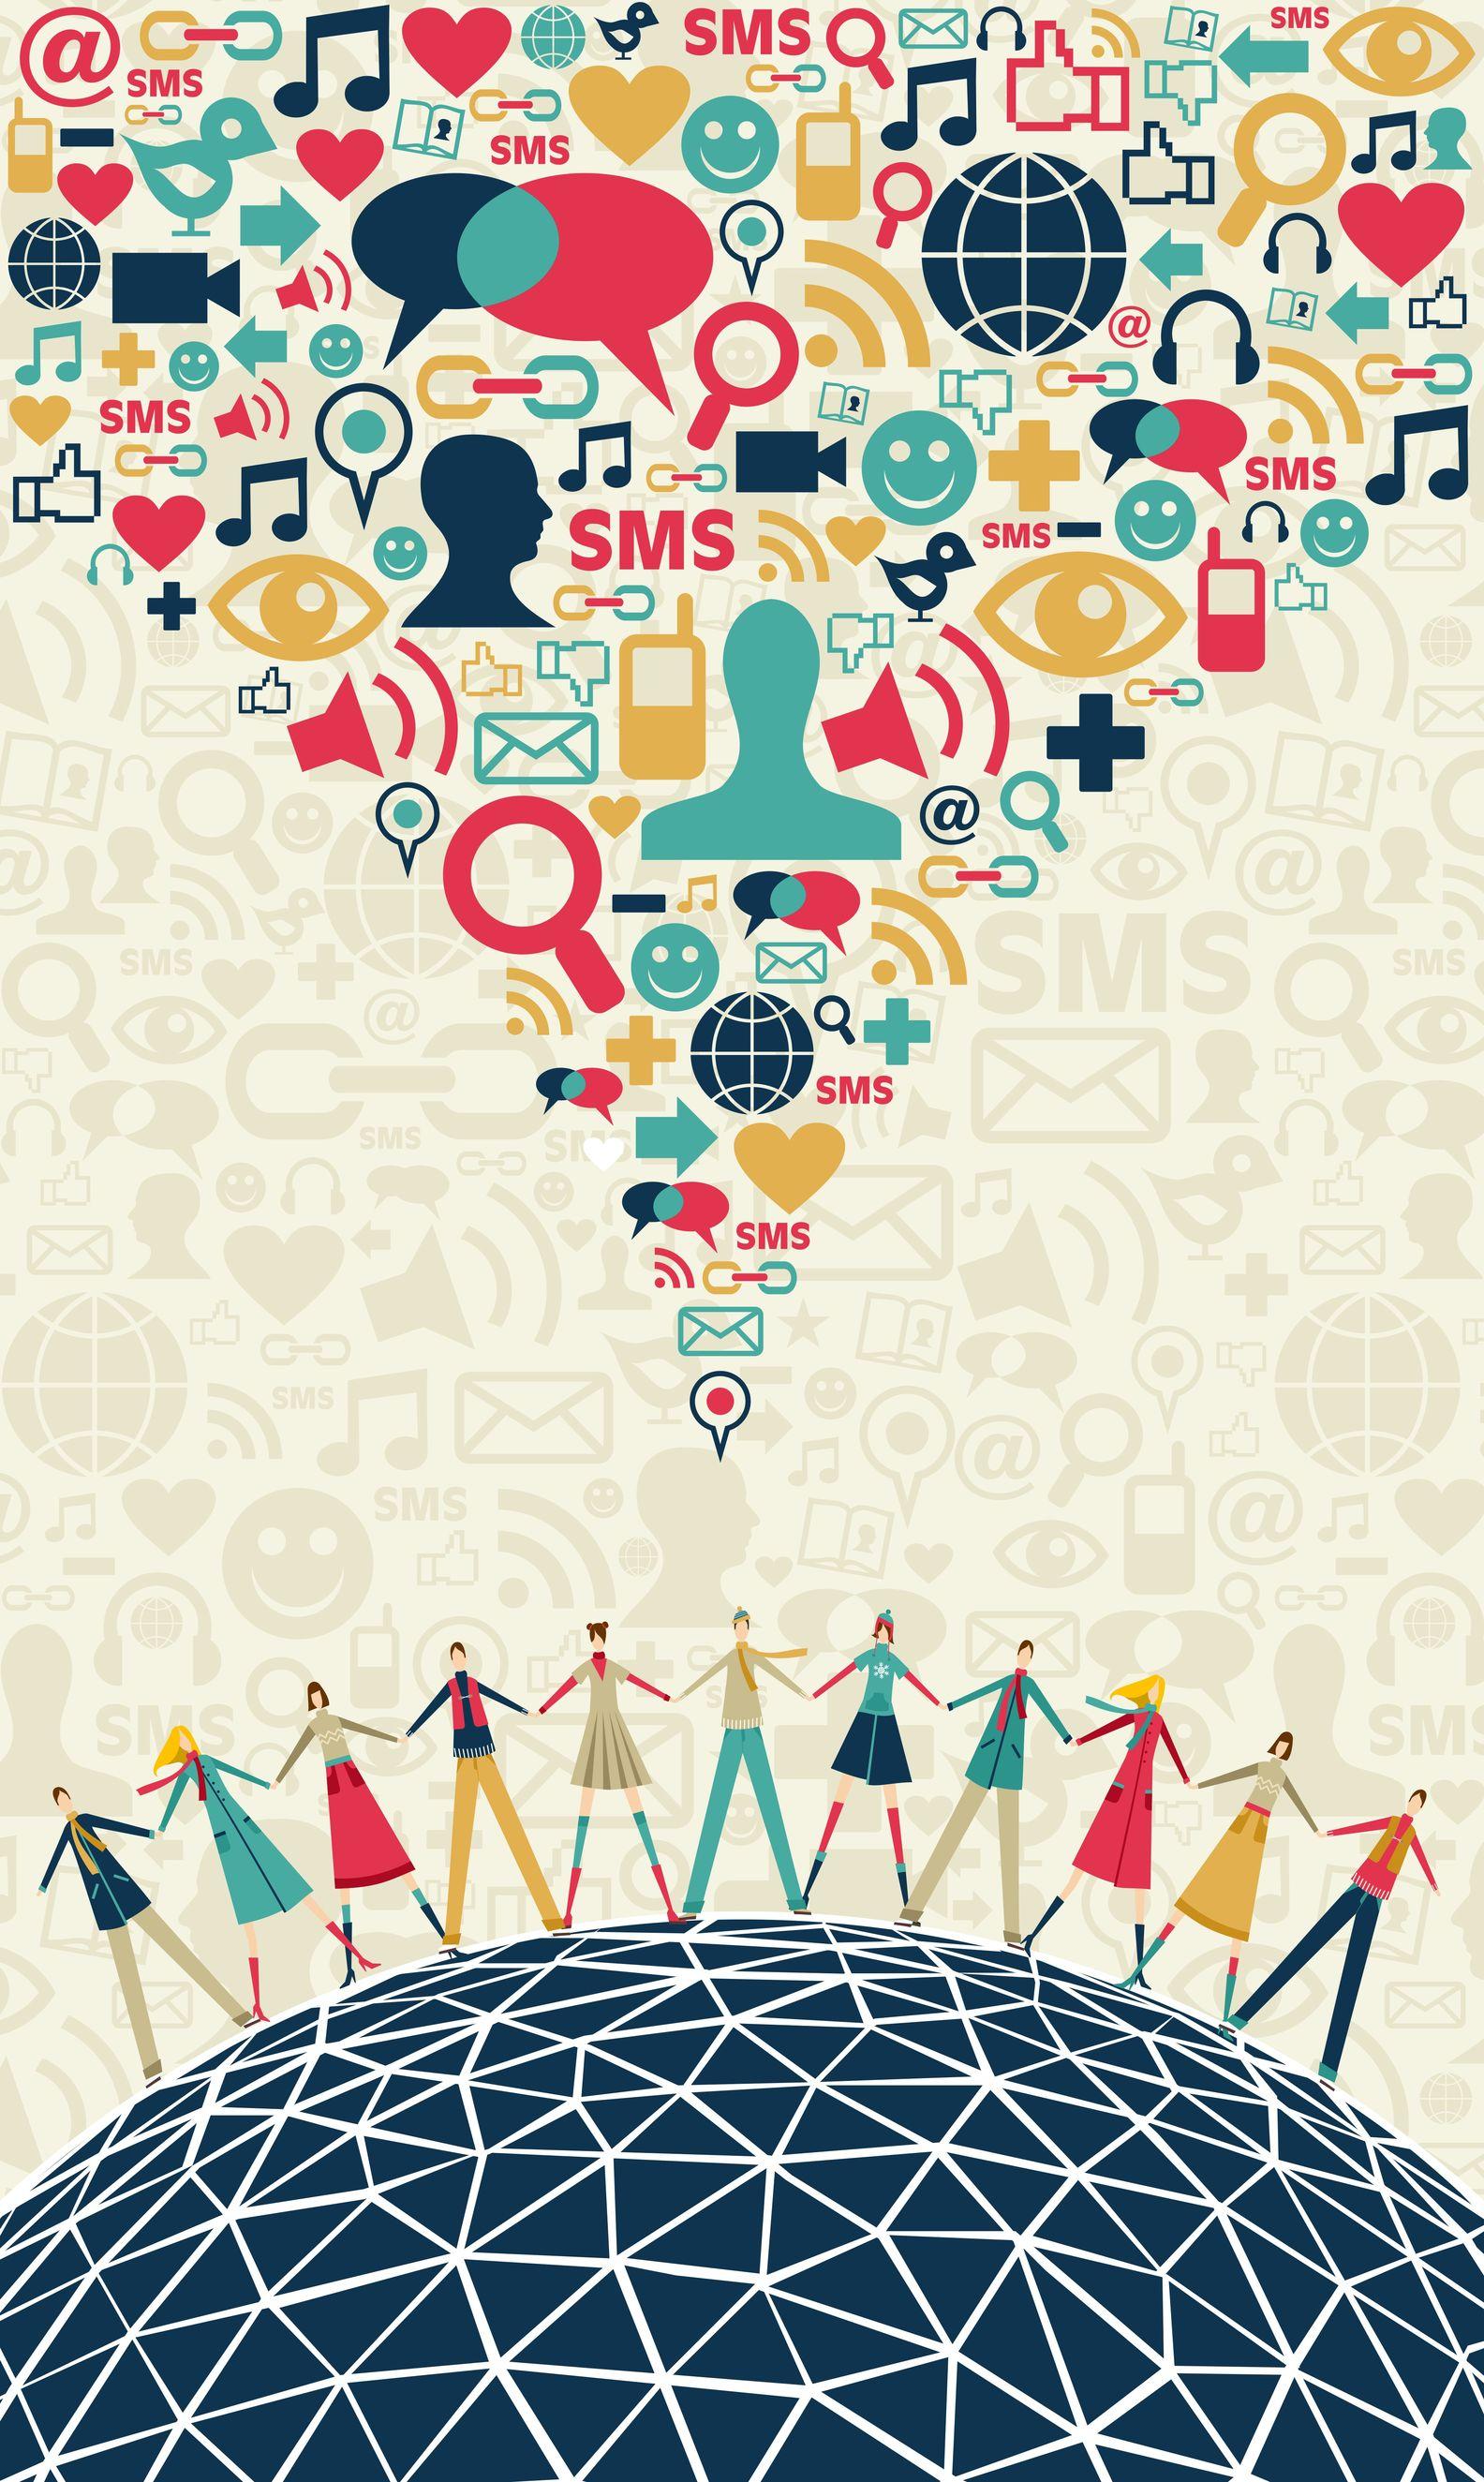 The Social Innovators of 2014